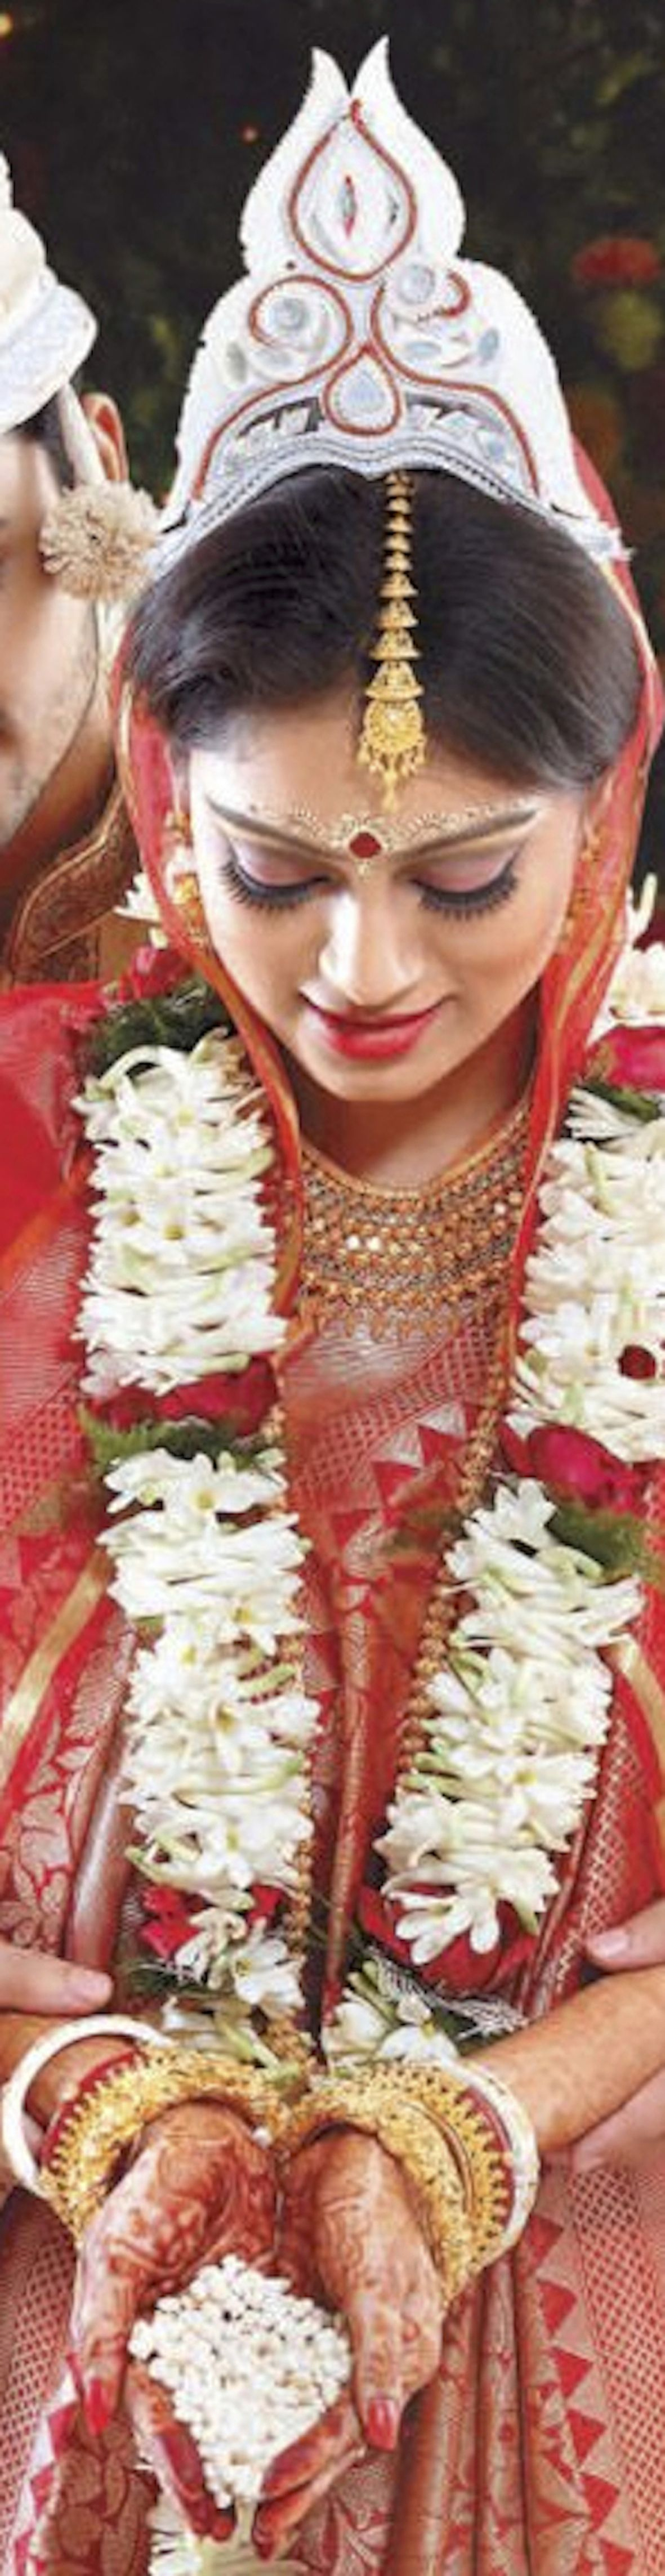 Bengali Bride With Traditional Sholapith Plant Stem Bark